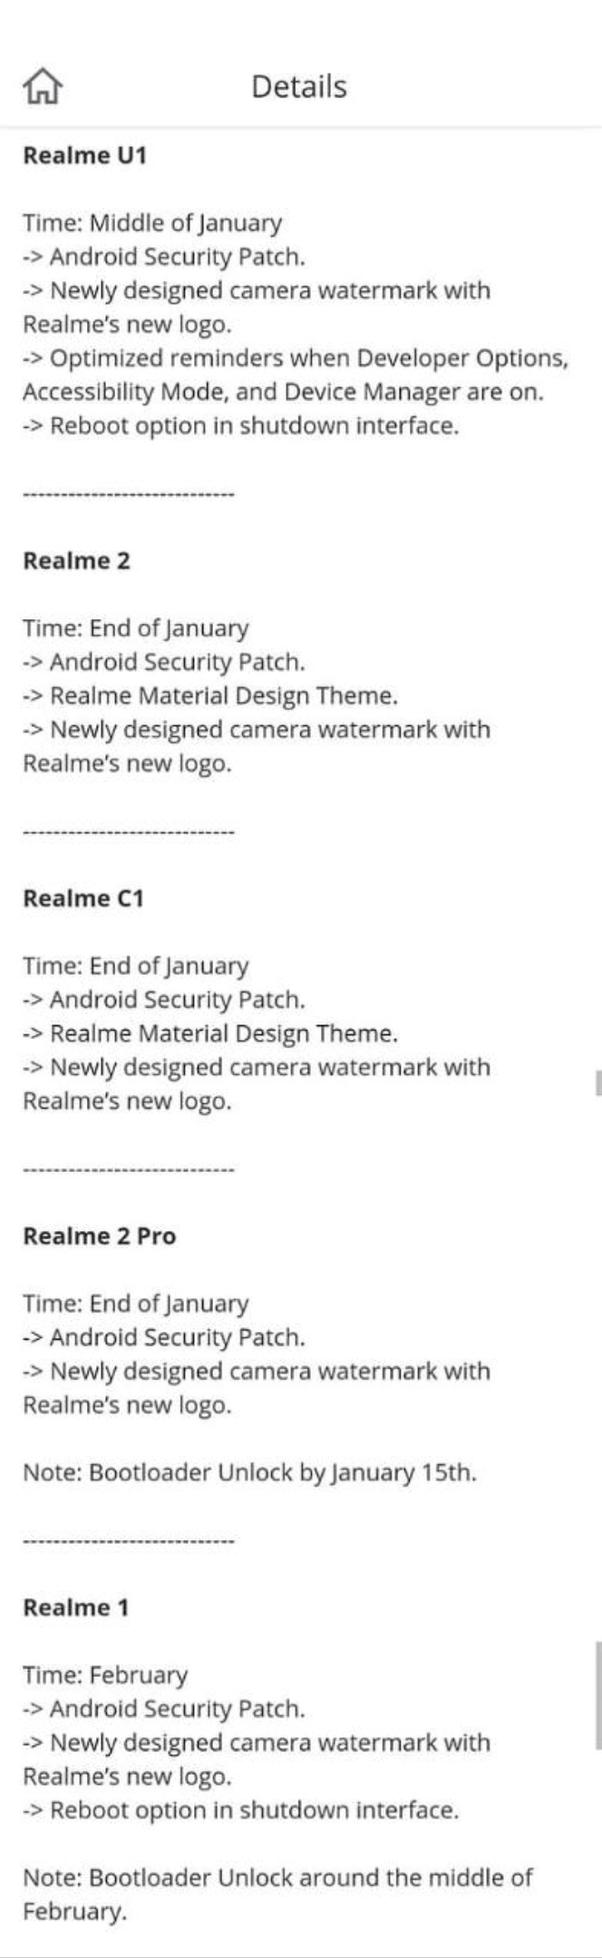 When will we start getting custom ROMs for Realme phones